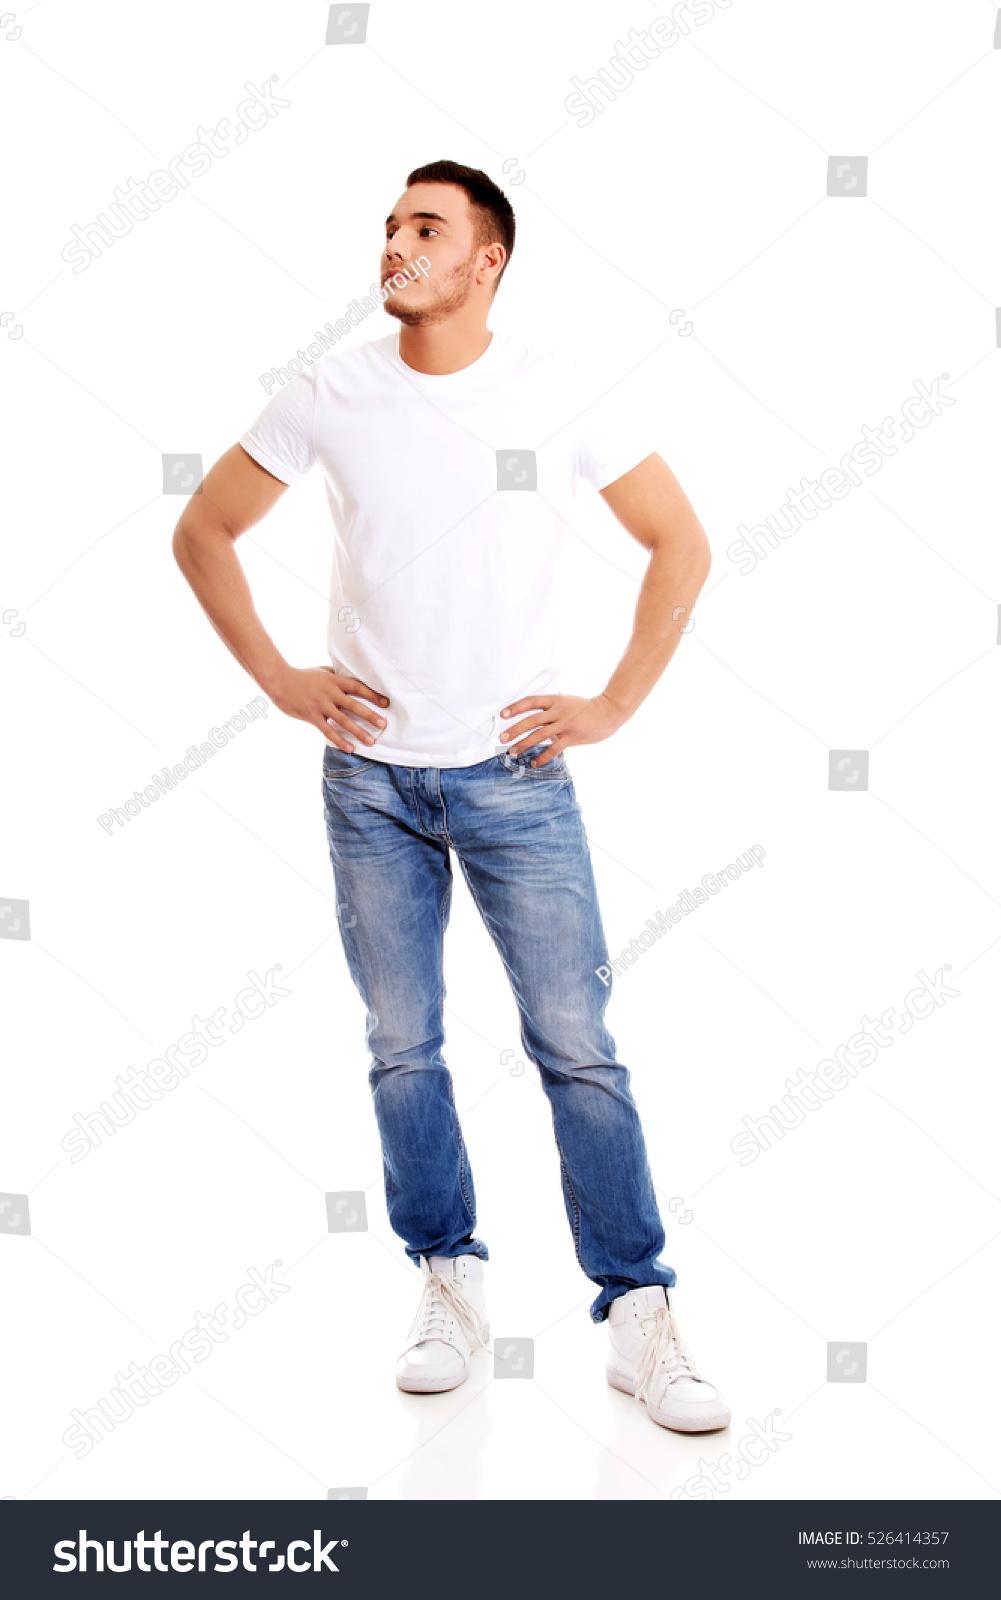 Young man white tshirt stock photo 526414357 shutterstock for Man in white shirt